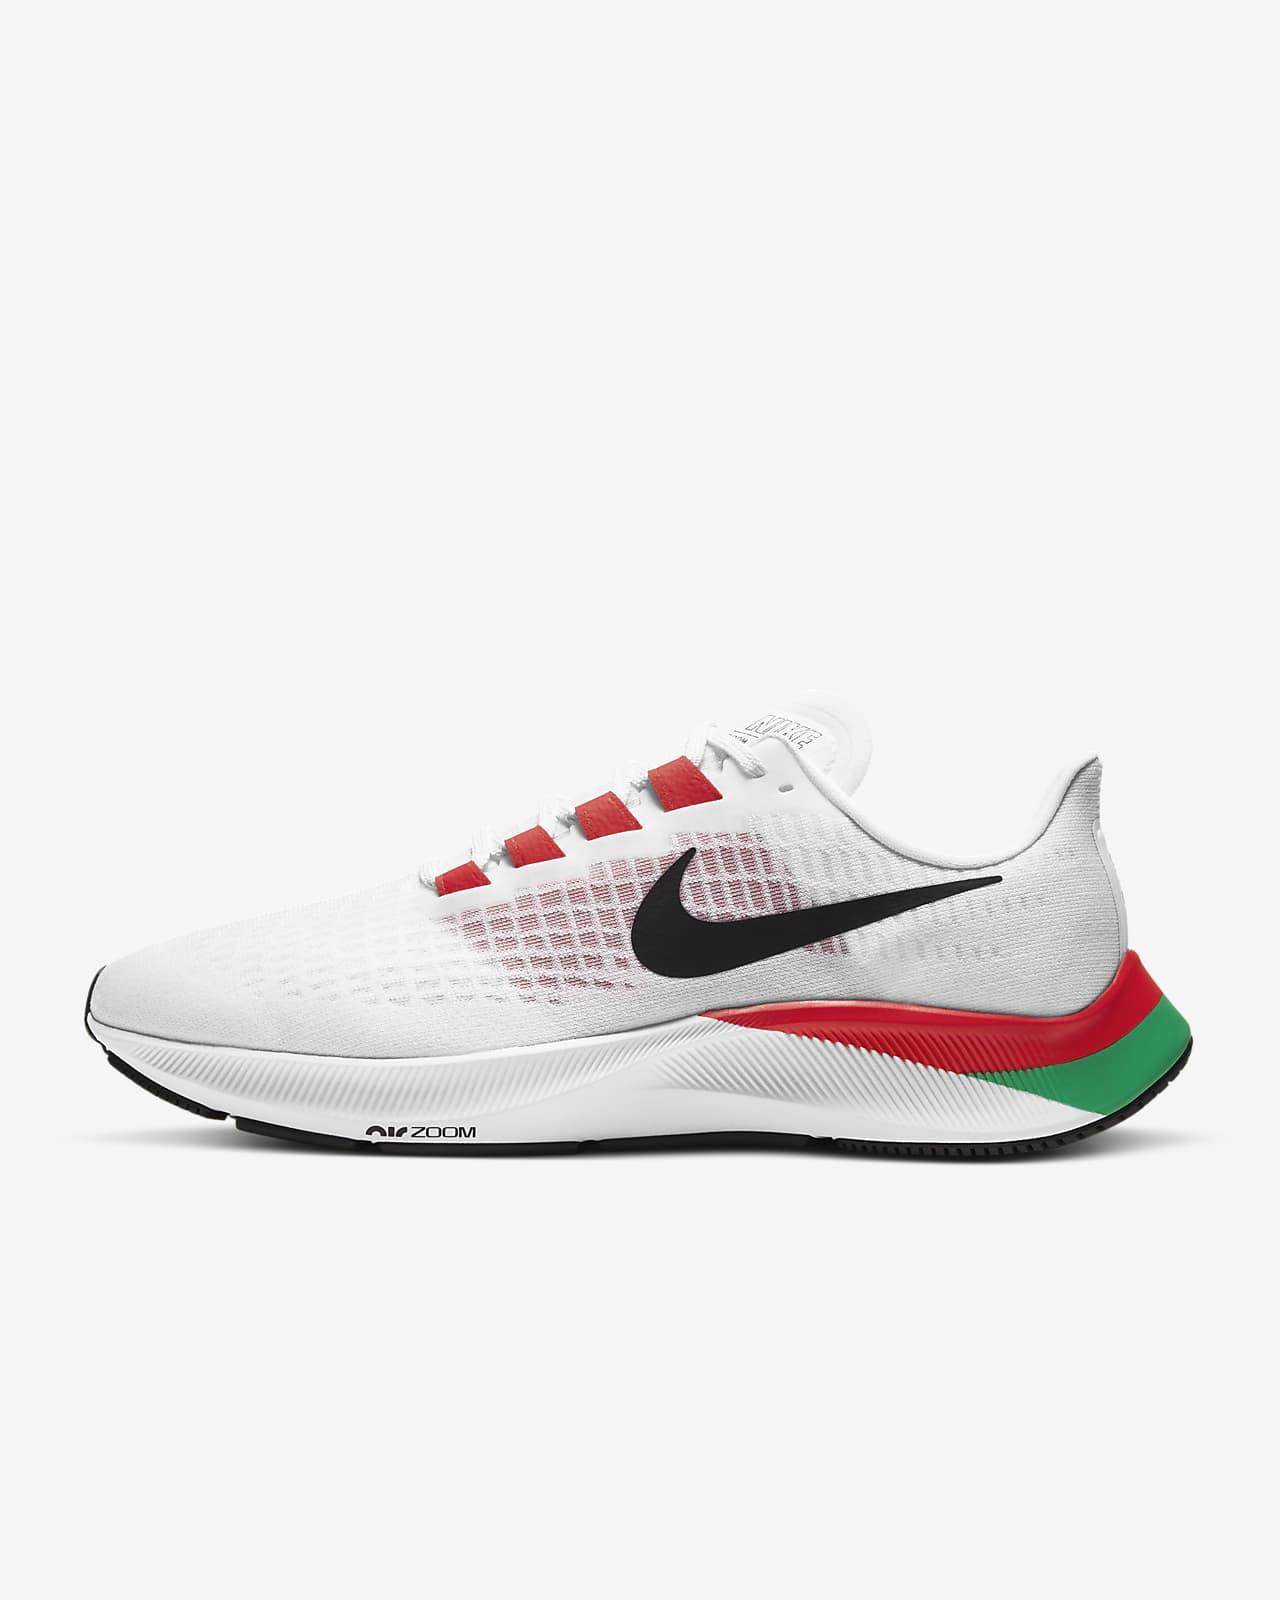 Chaussure de running Nike Air Zoom Pegasus 37 Eliud Kipchoge pour ...